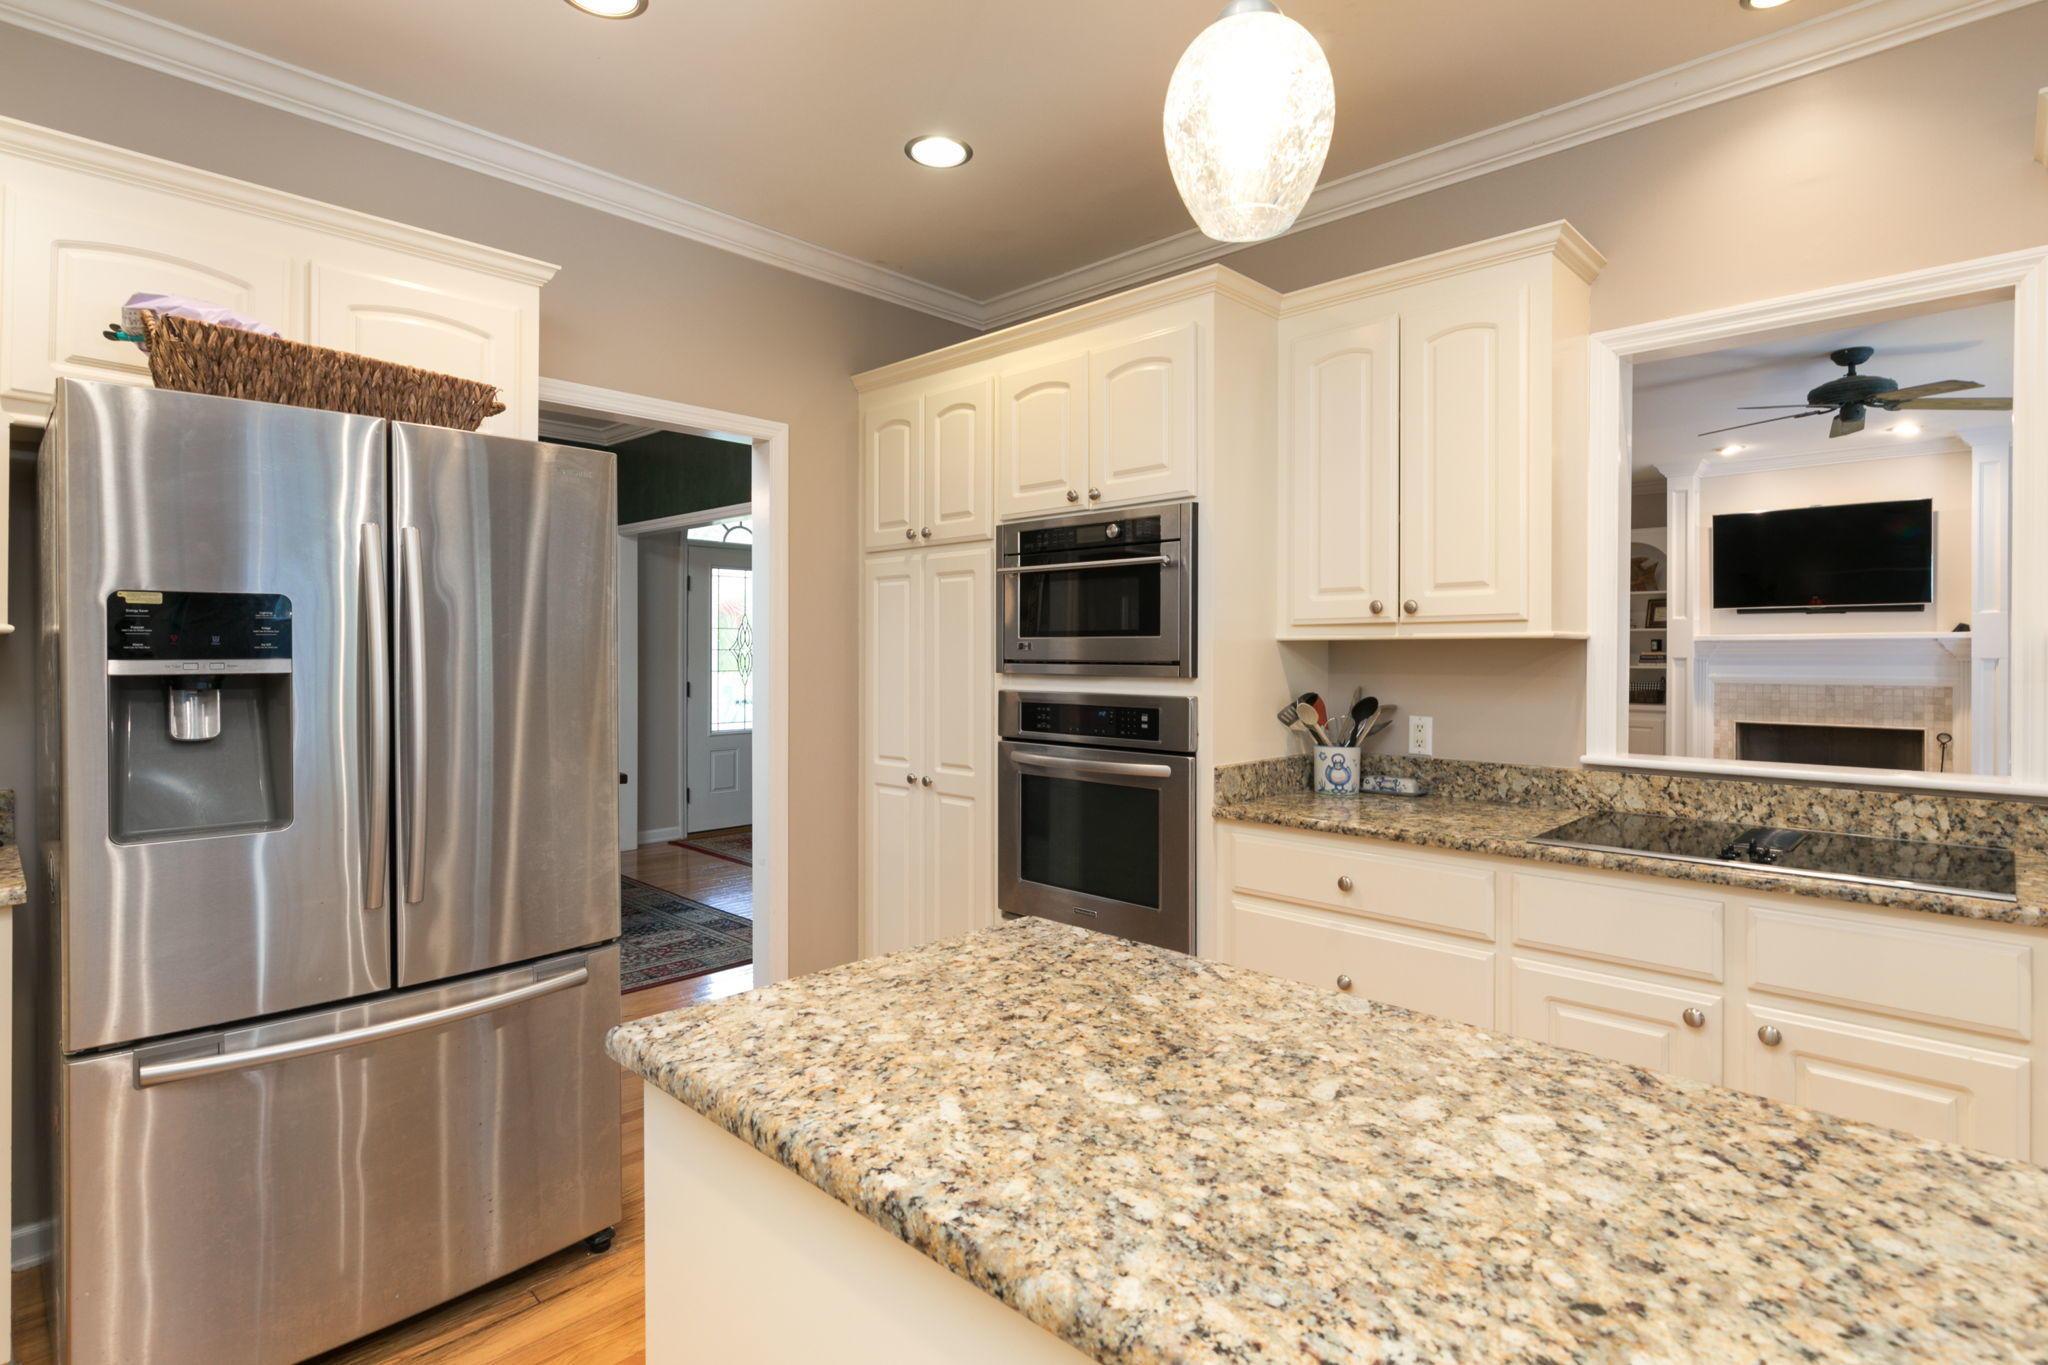 Dunes West Homes For Sale - 3625 Colonel Vanderhorst, Mount Pleasant, SC - 25